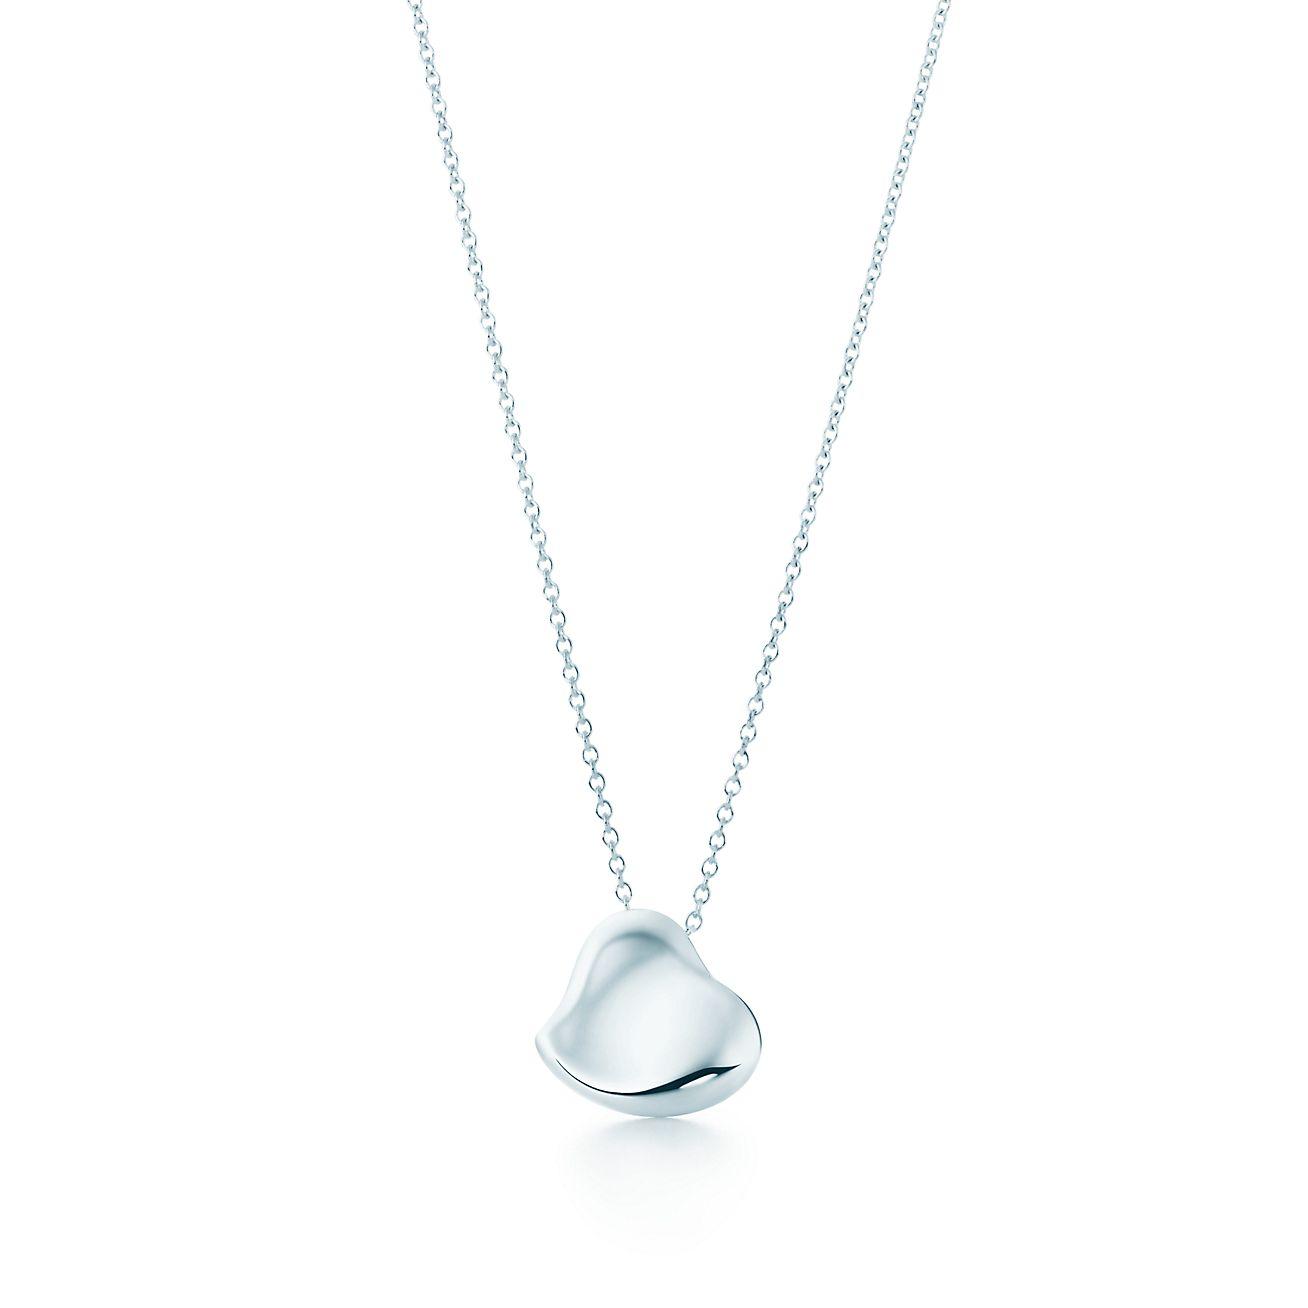 f04db4c06 Tiffany & Co. Elsa Peretti® Full Heart pendant in sterling silver ...